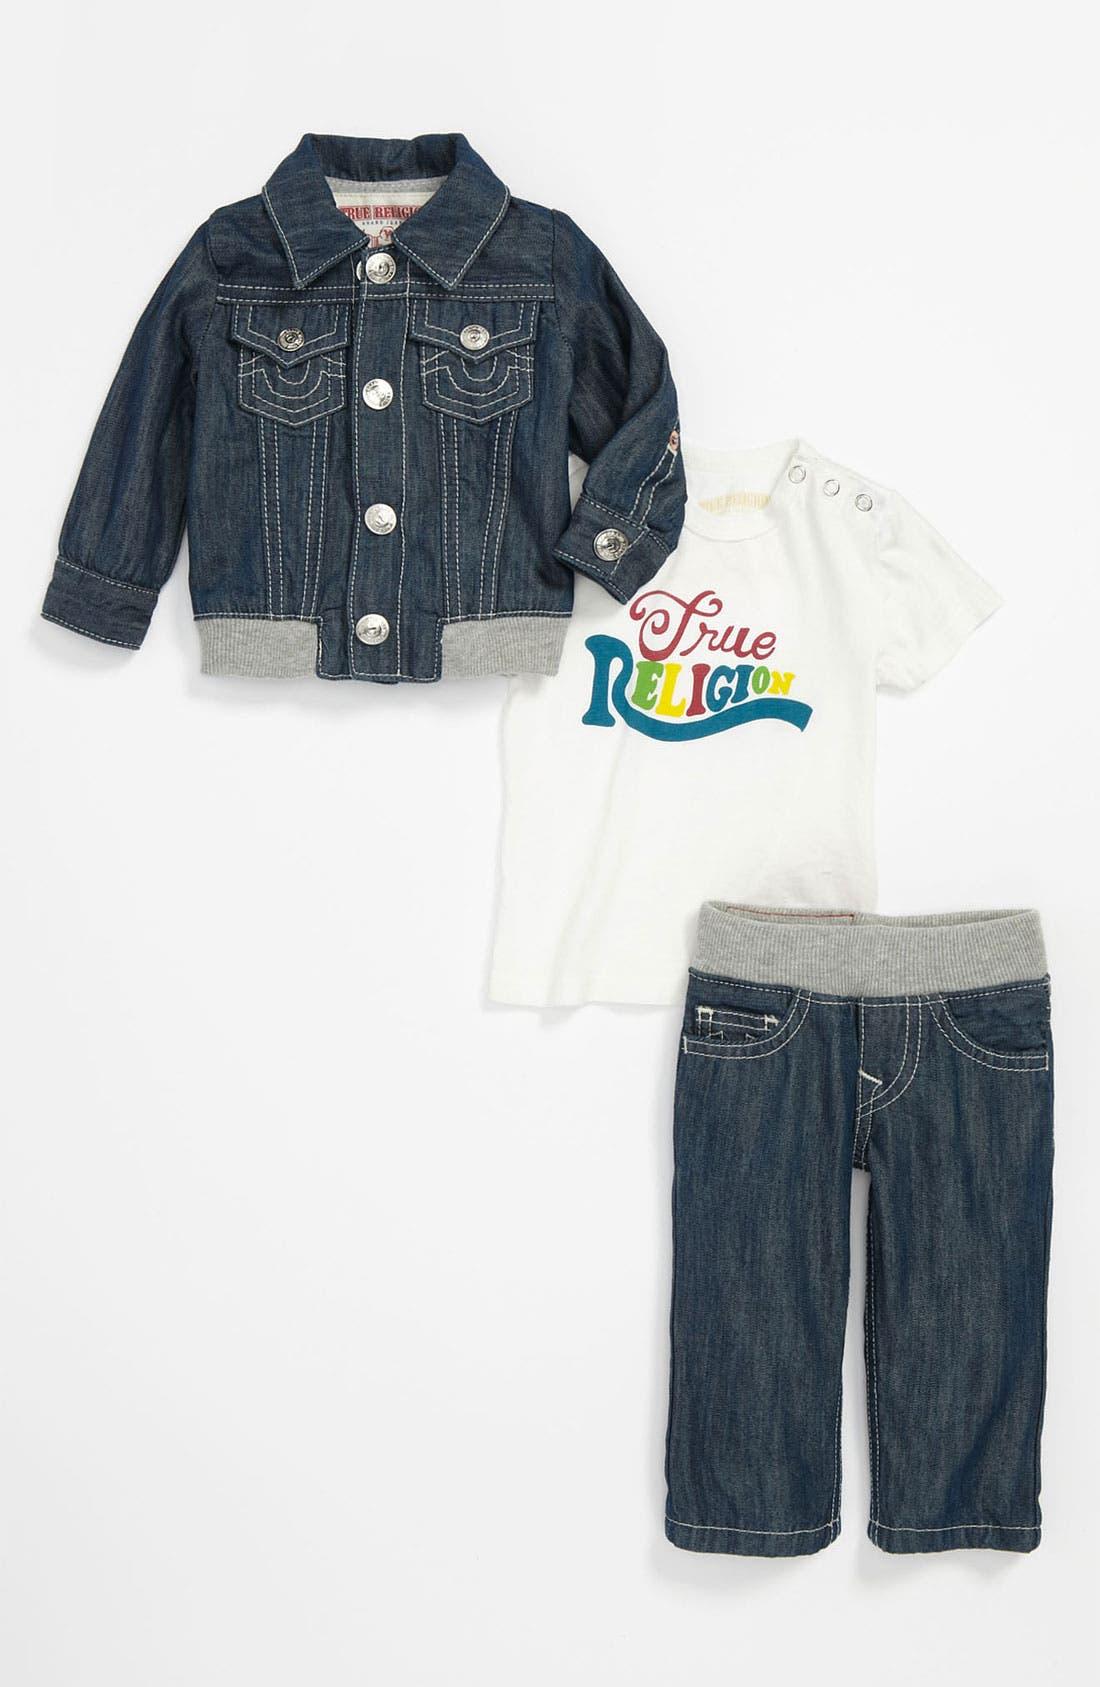 Main Image - True Religion Brand Jeans Shirt, Jacket & Jeans Gift Set (Infant)